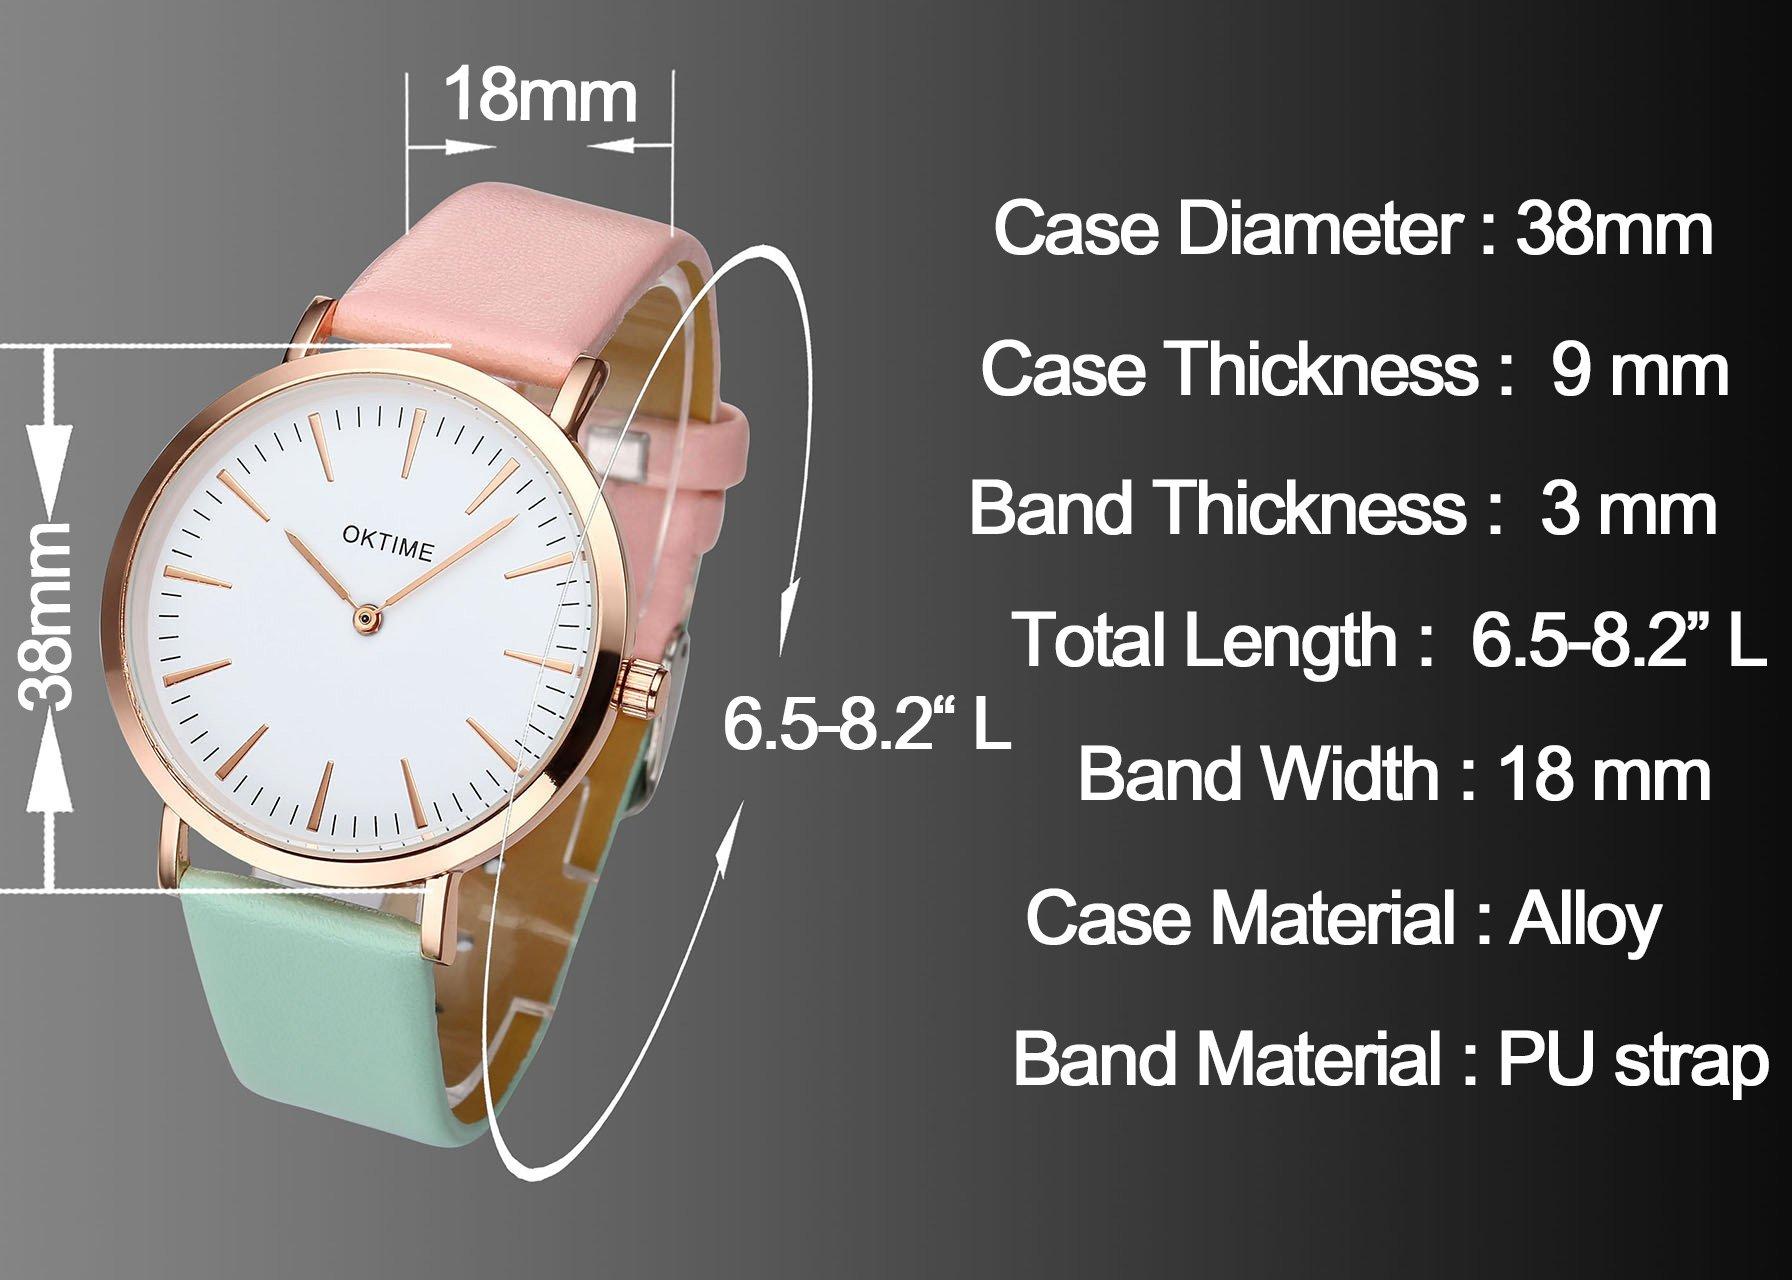 JSDDE Uhren,Fashion Cute Candy Farbe Damen Armbanduhr Pink-Grün Farbverlauf Kleid Uhr PU Lederband Analog Quarz Uhr